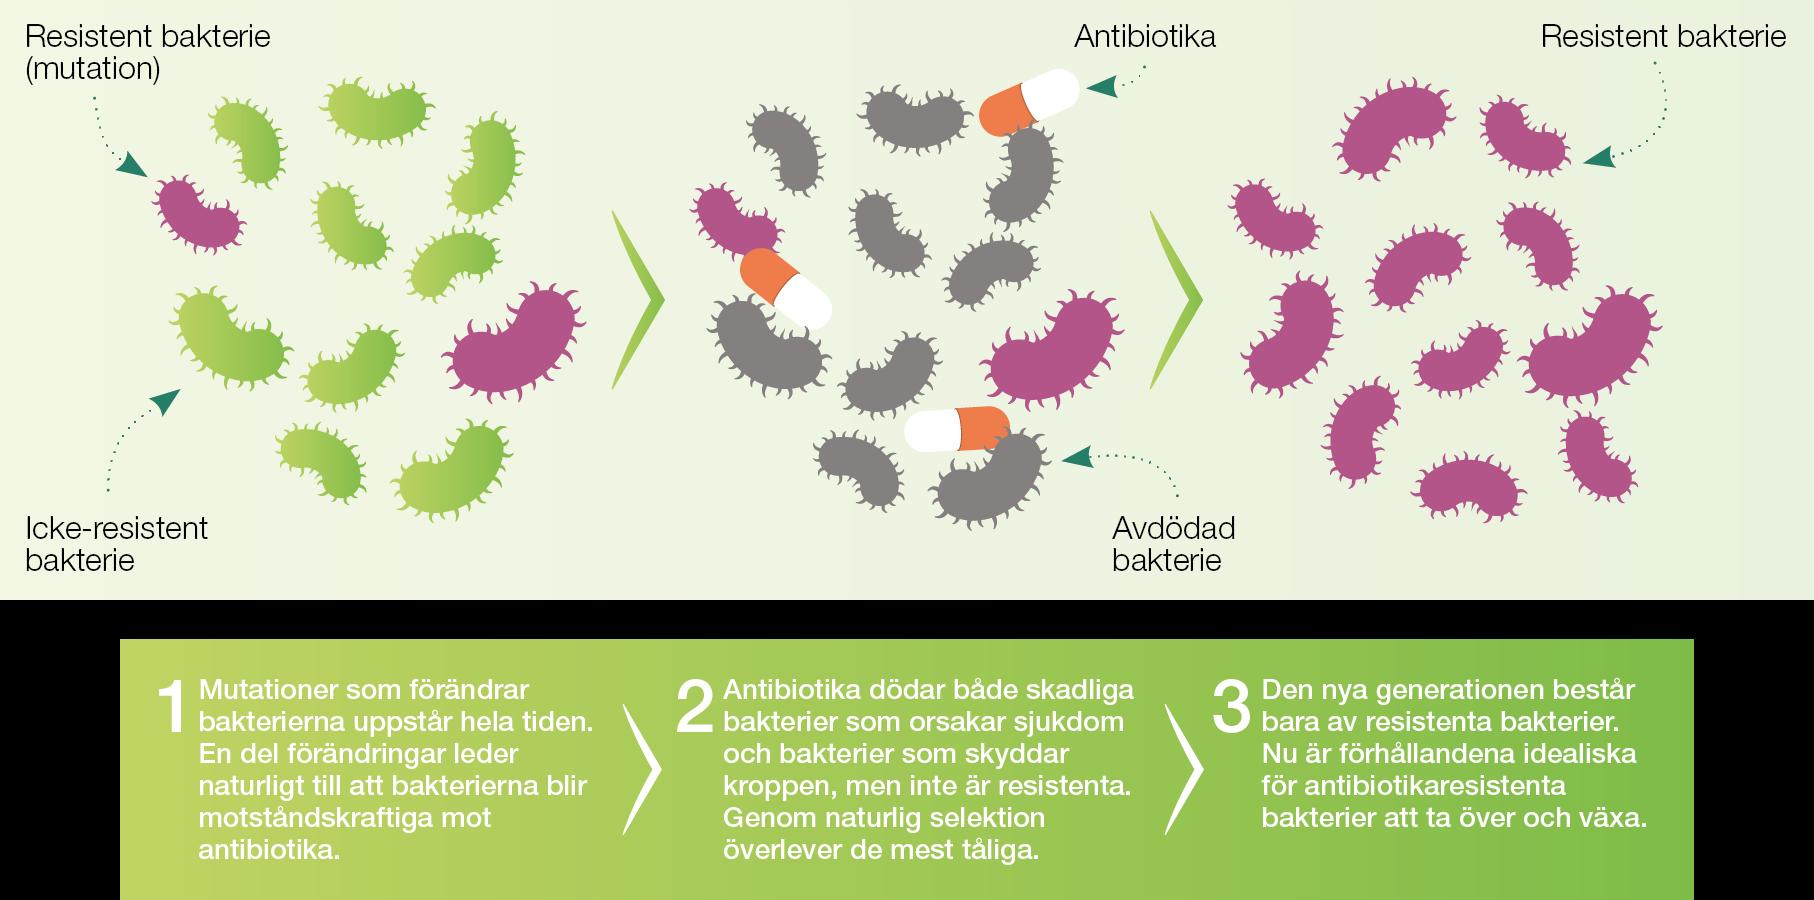 Bactiguard_antibiotikaresistens_amr